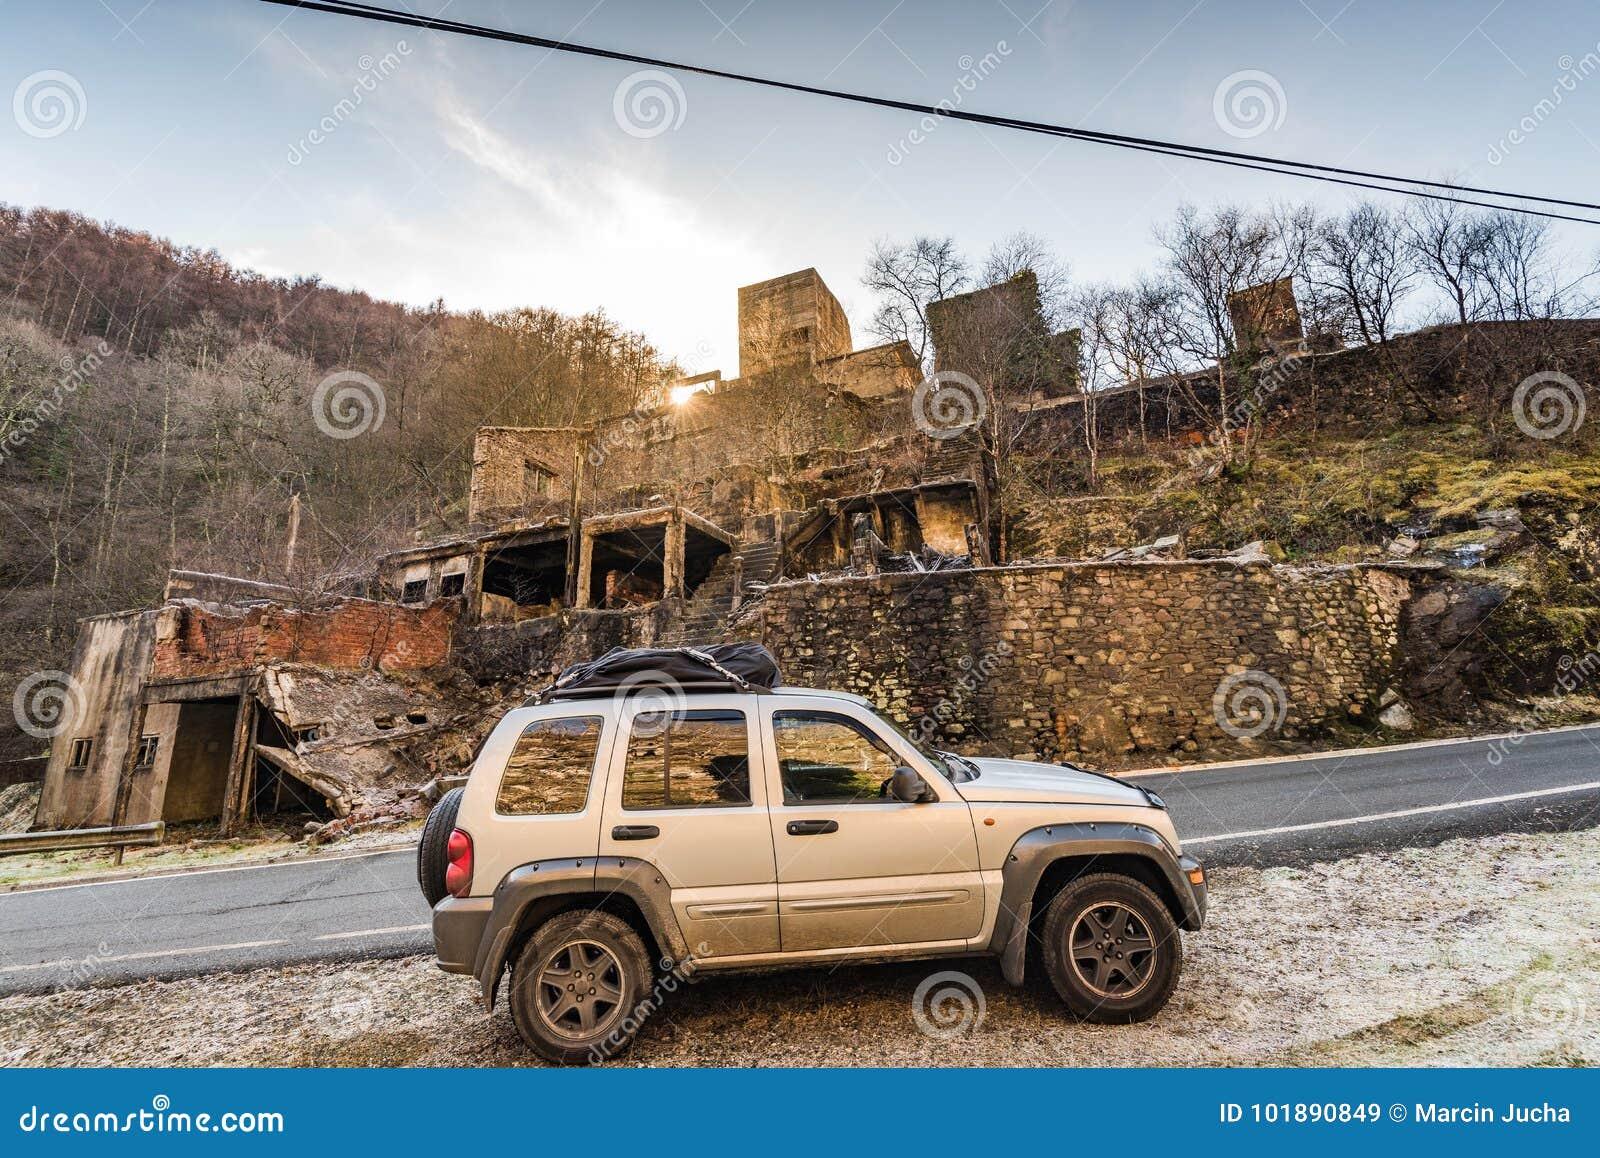 Off road car by abandoned burnt village